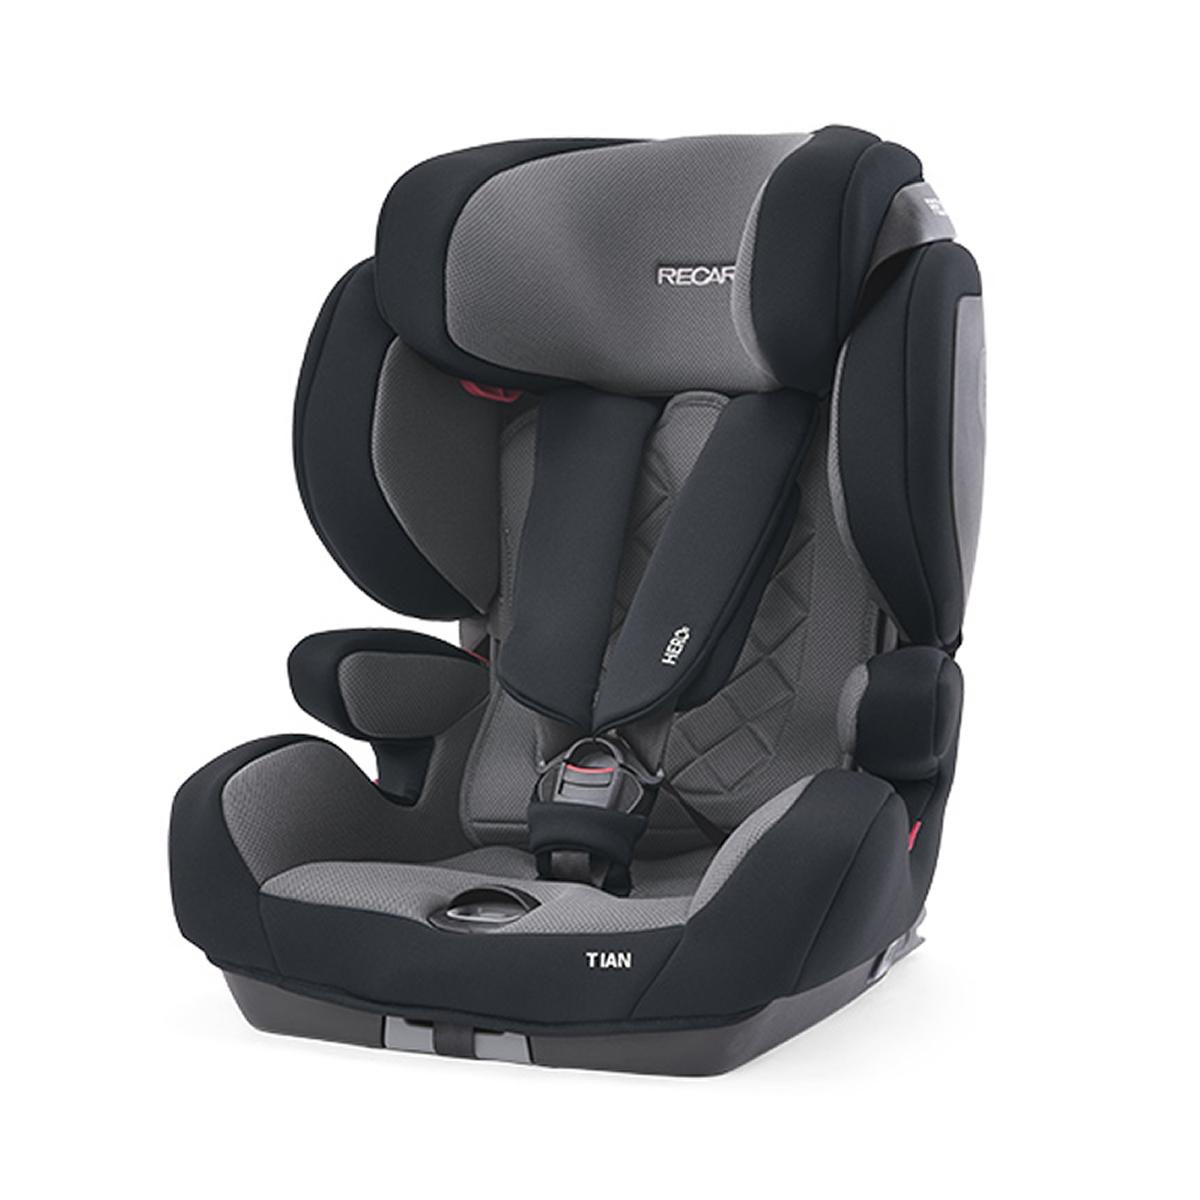 Recaro Tian Core Group 1 Car Seat-Carbon Black